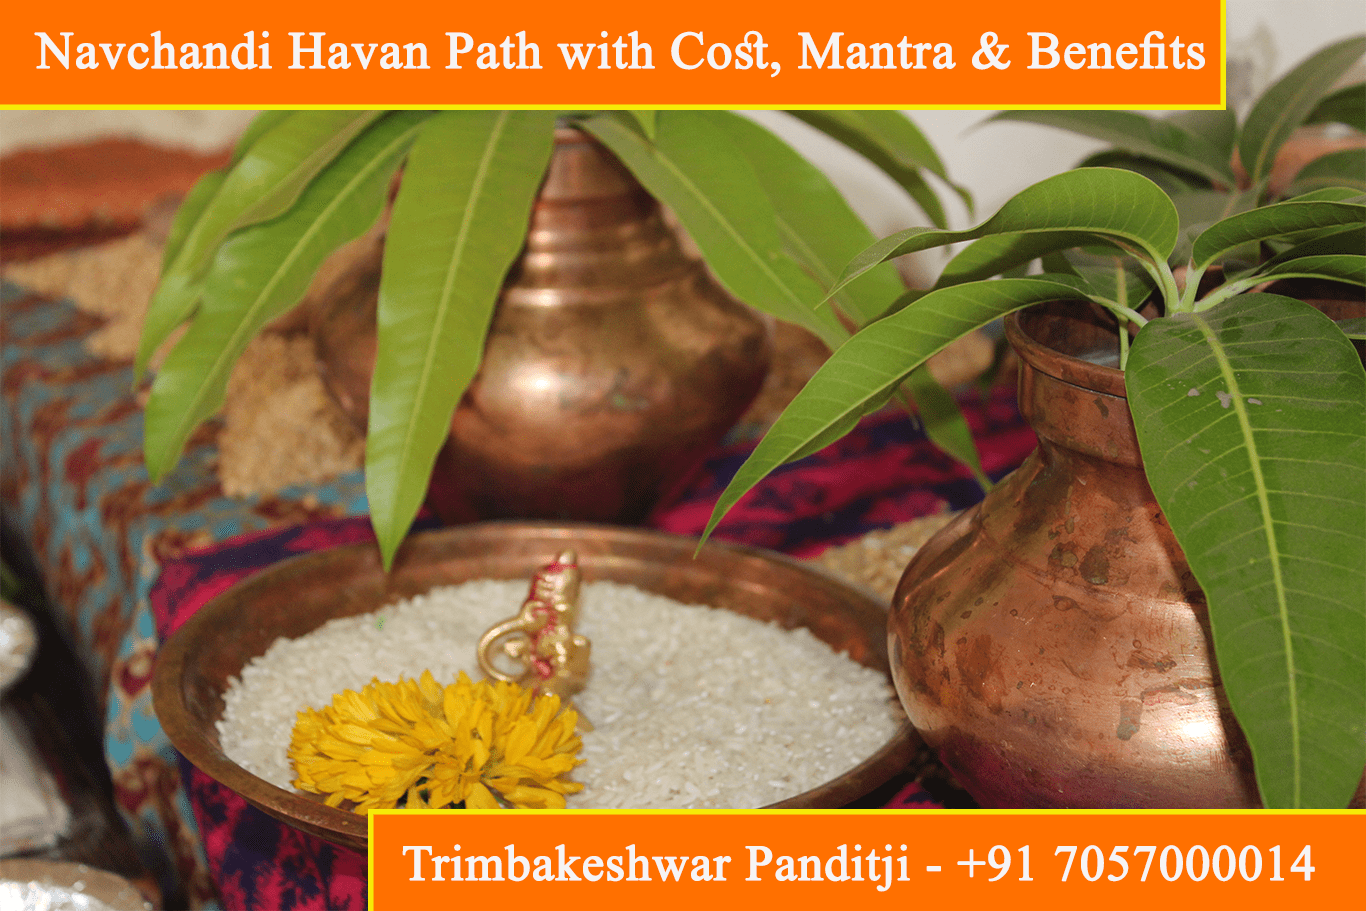 Navchandi Havan, Yagna, Puja, Path with Cost, Mantra & Benefits